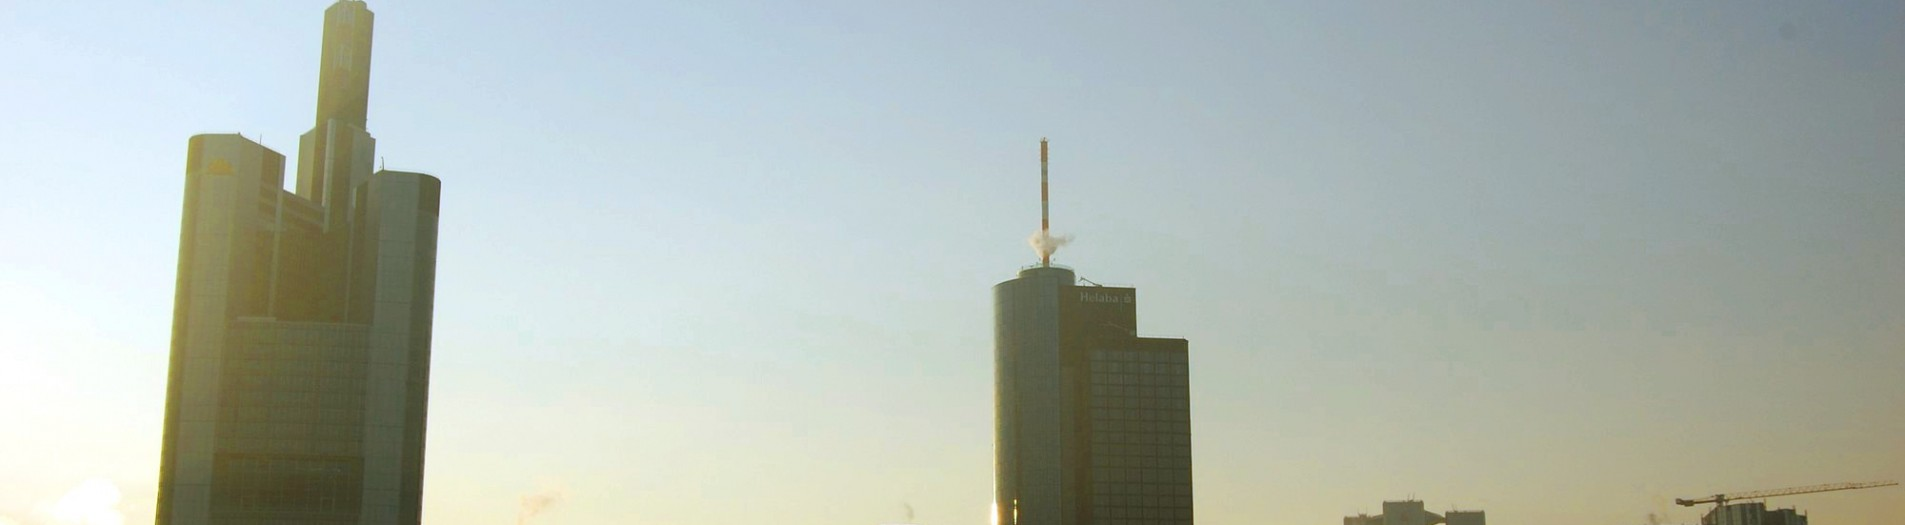 Weekend in Frankfurt - part II